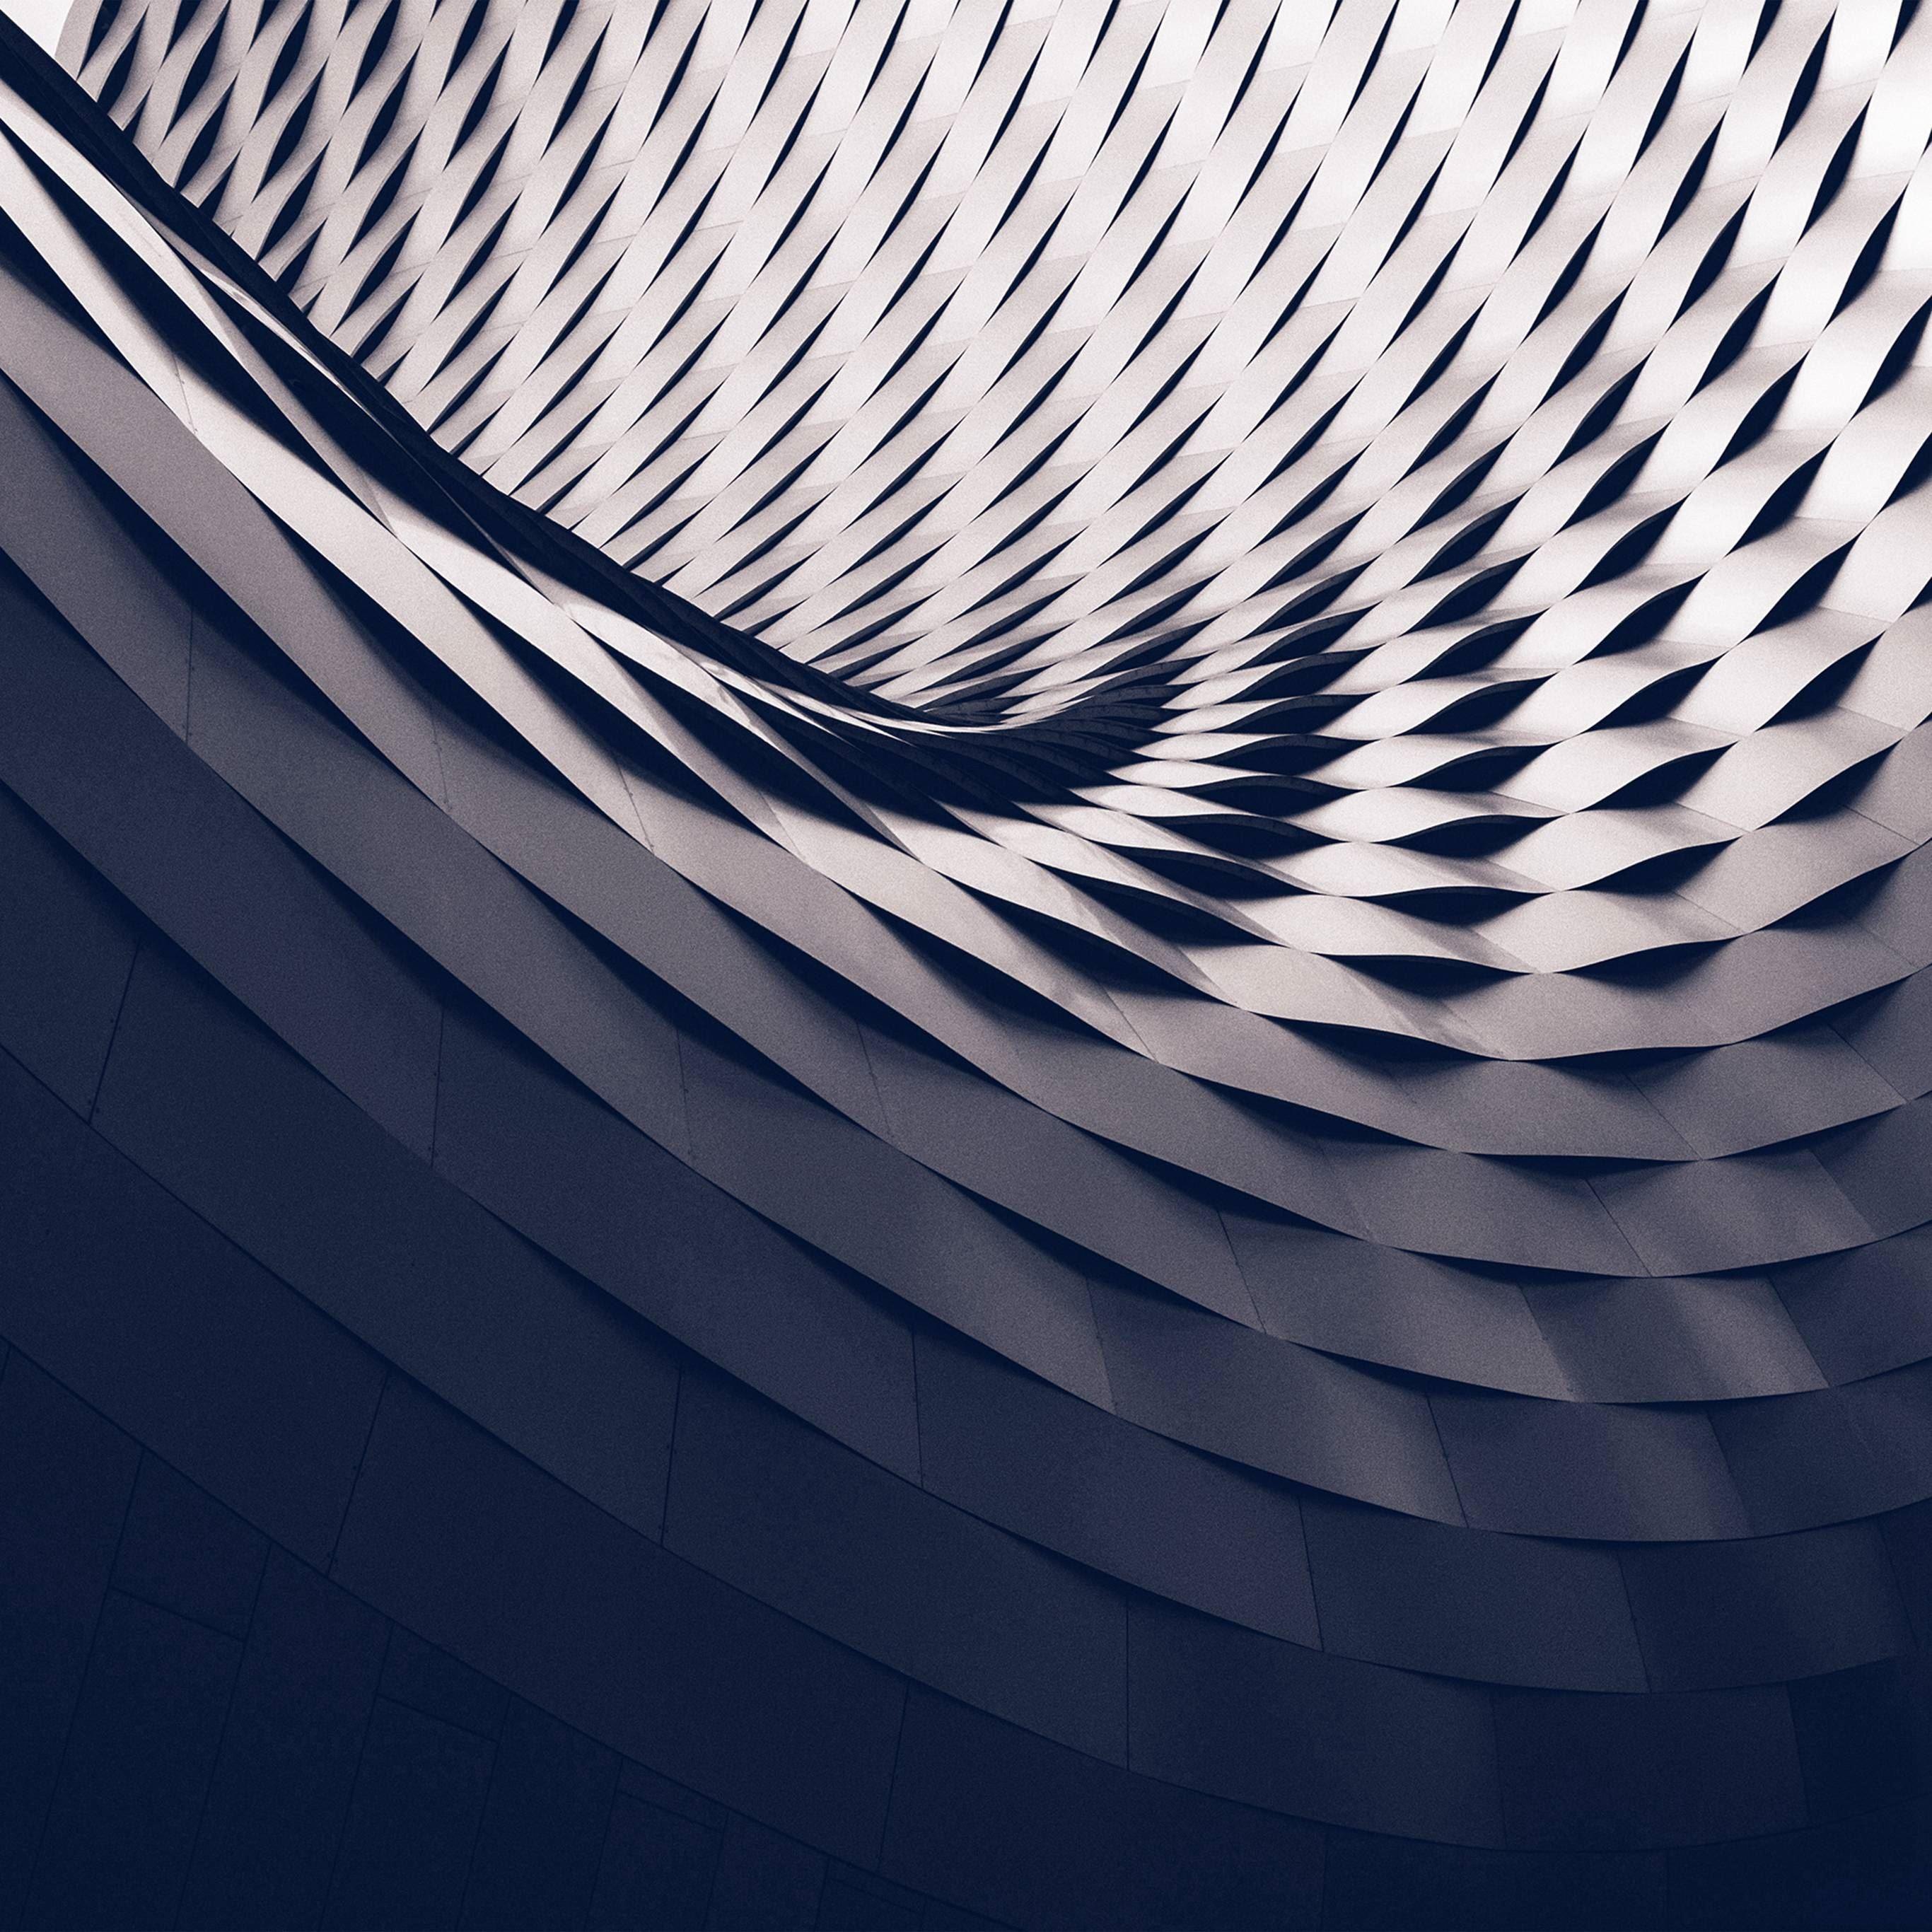 Art Architecture Dark City Blue Pattern iPad Pro wallpaper